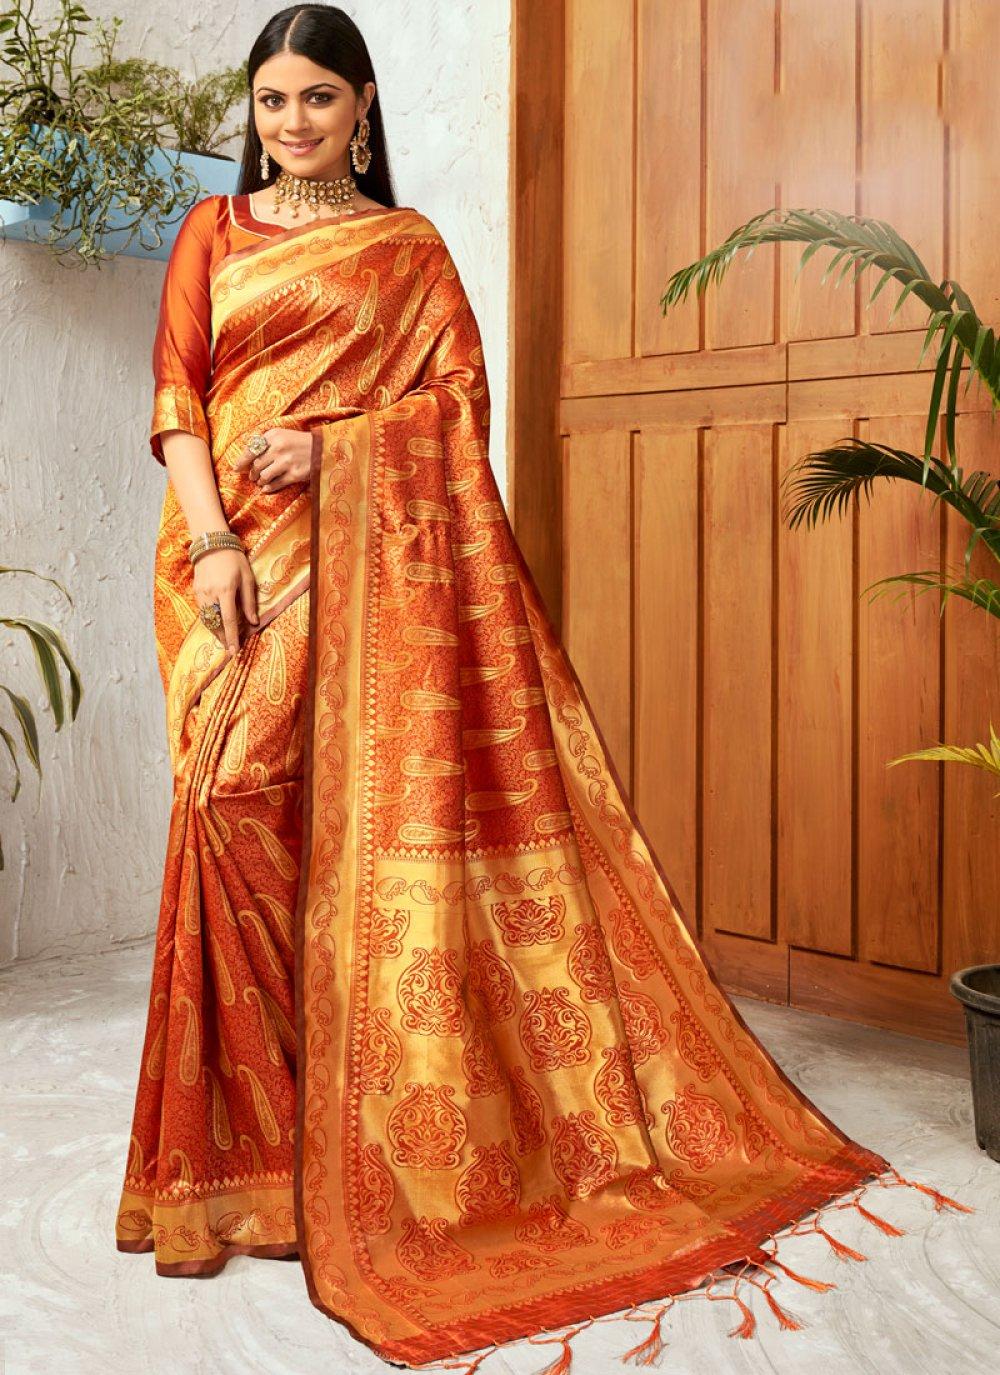 Gold and Orange Weaving Classic Saree